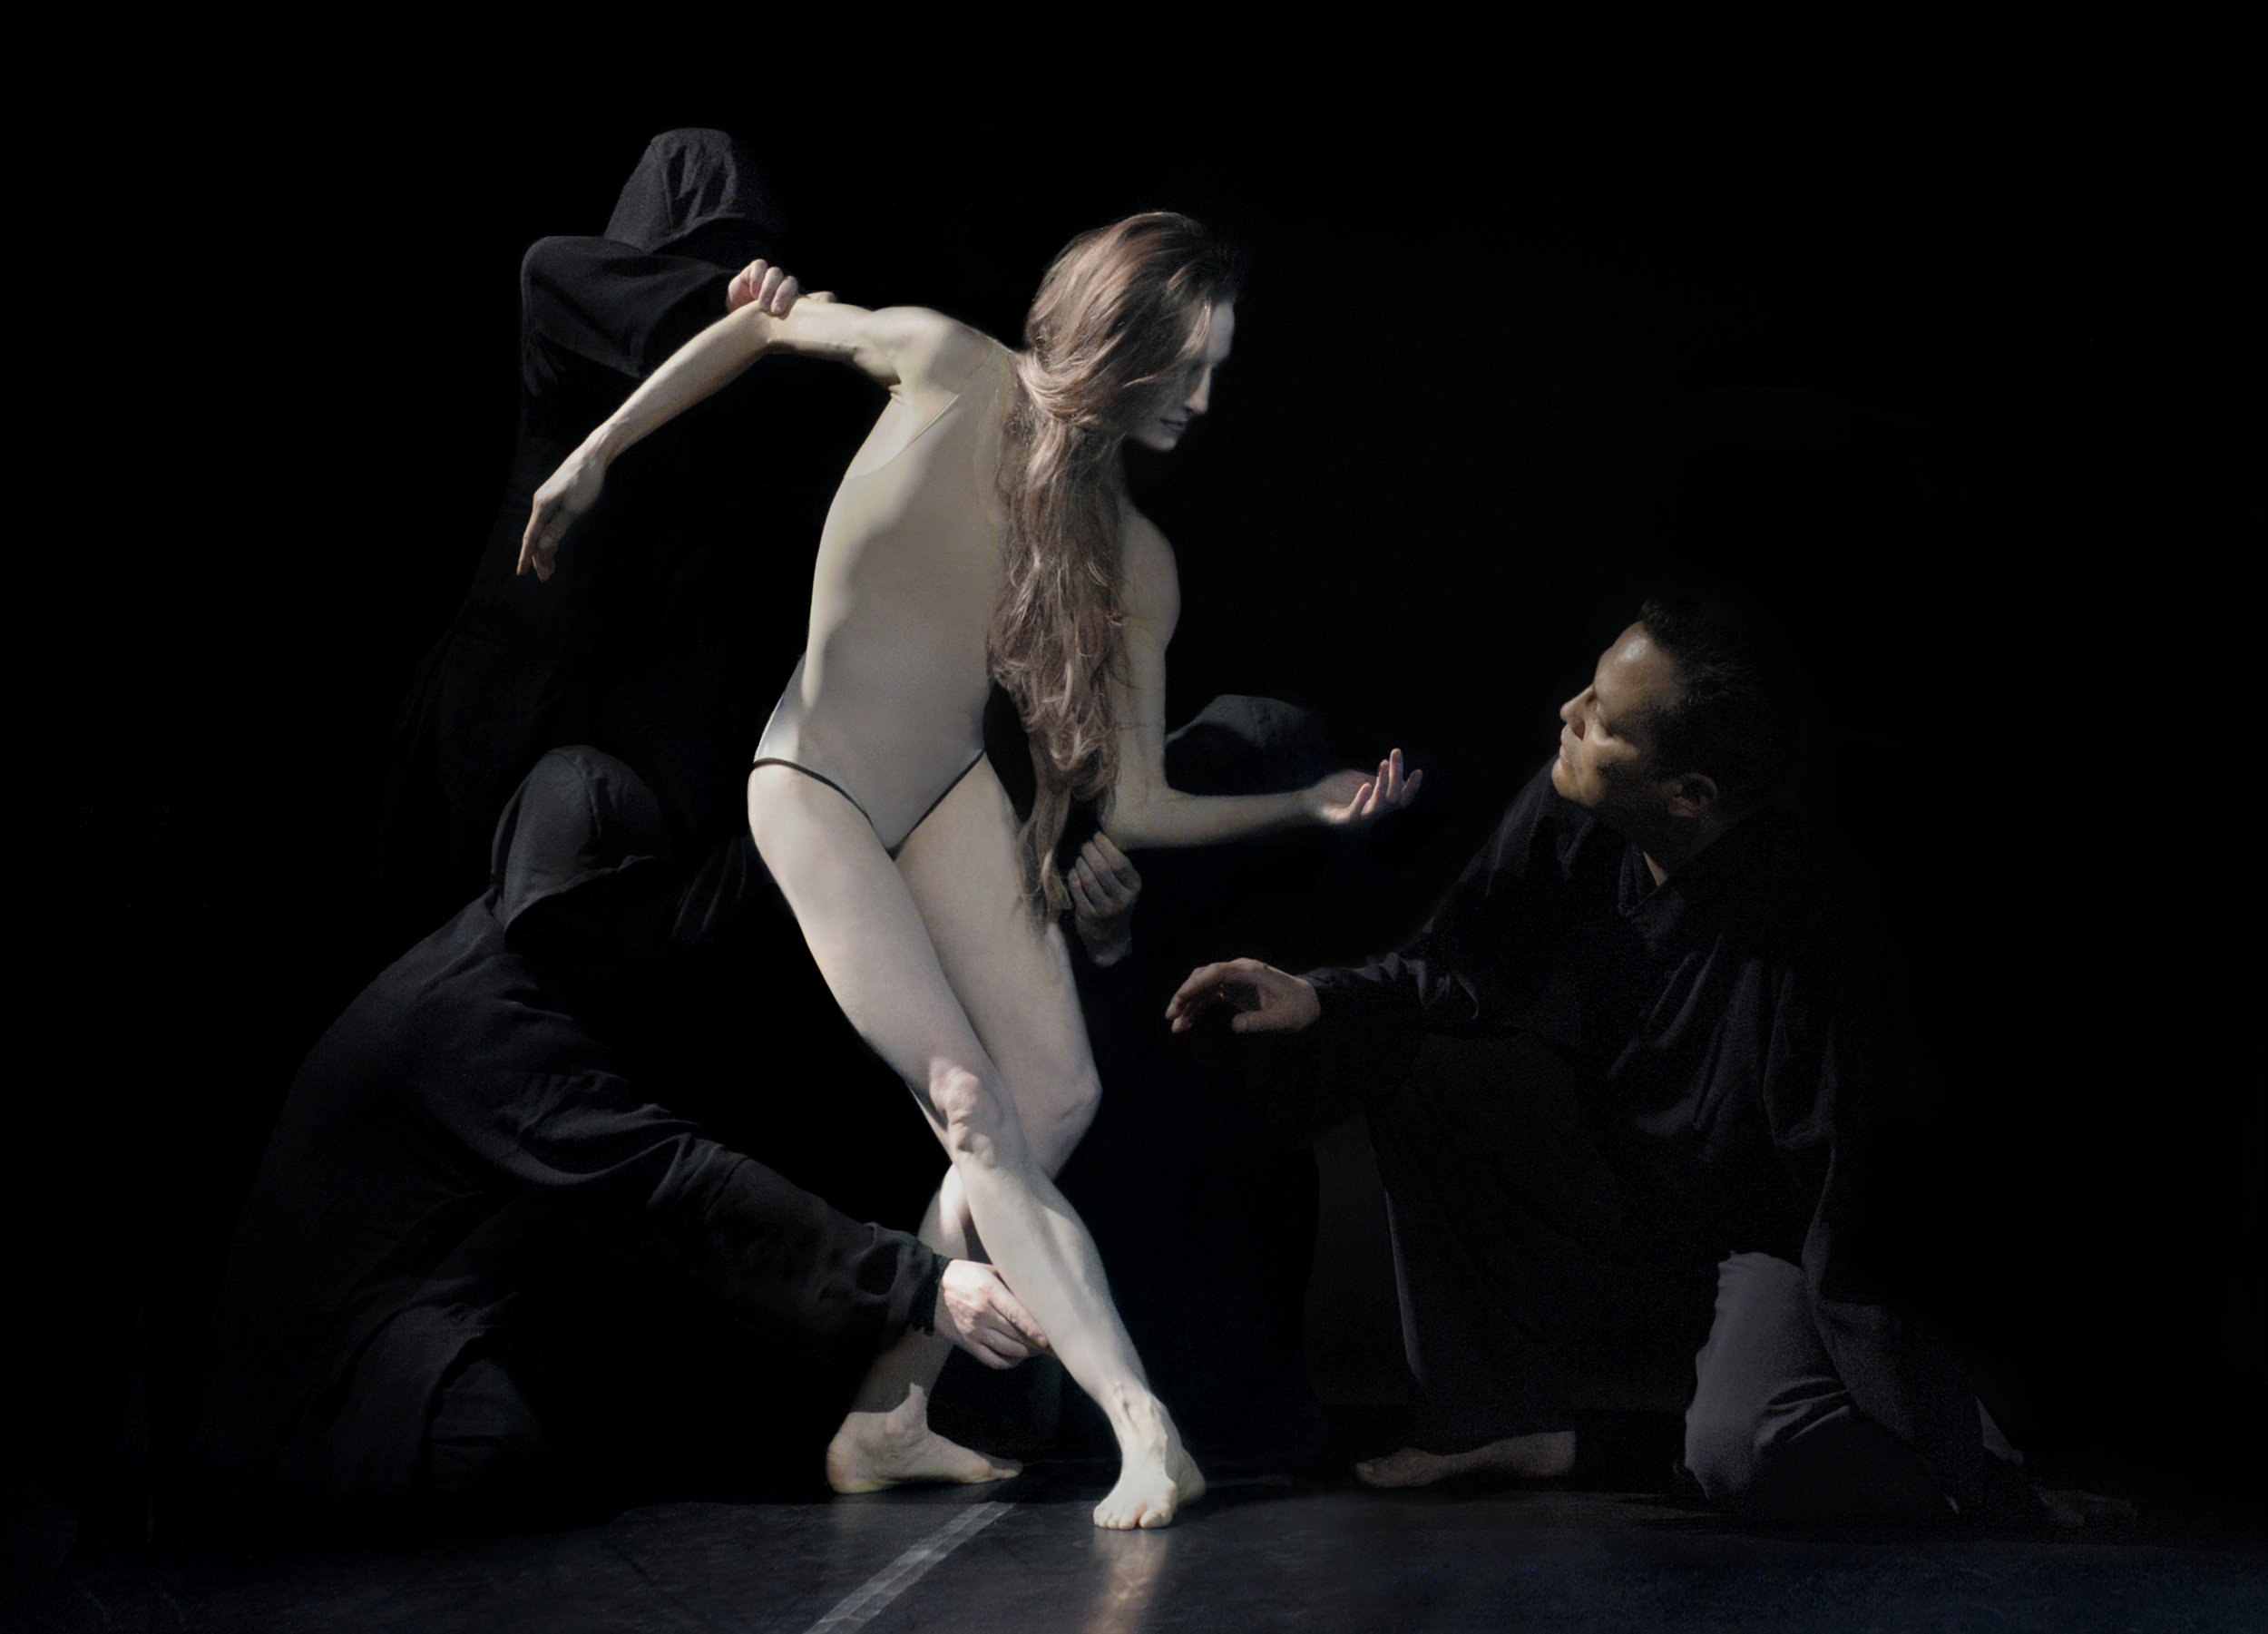 Dancers Wendy Whelan and Jock Soto star in the world premiere of HAGOROMO. Photo by David Michalek.